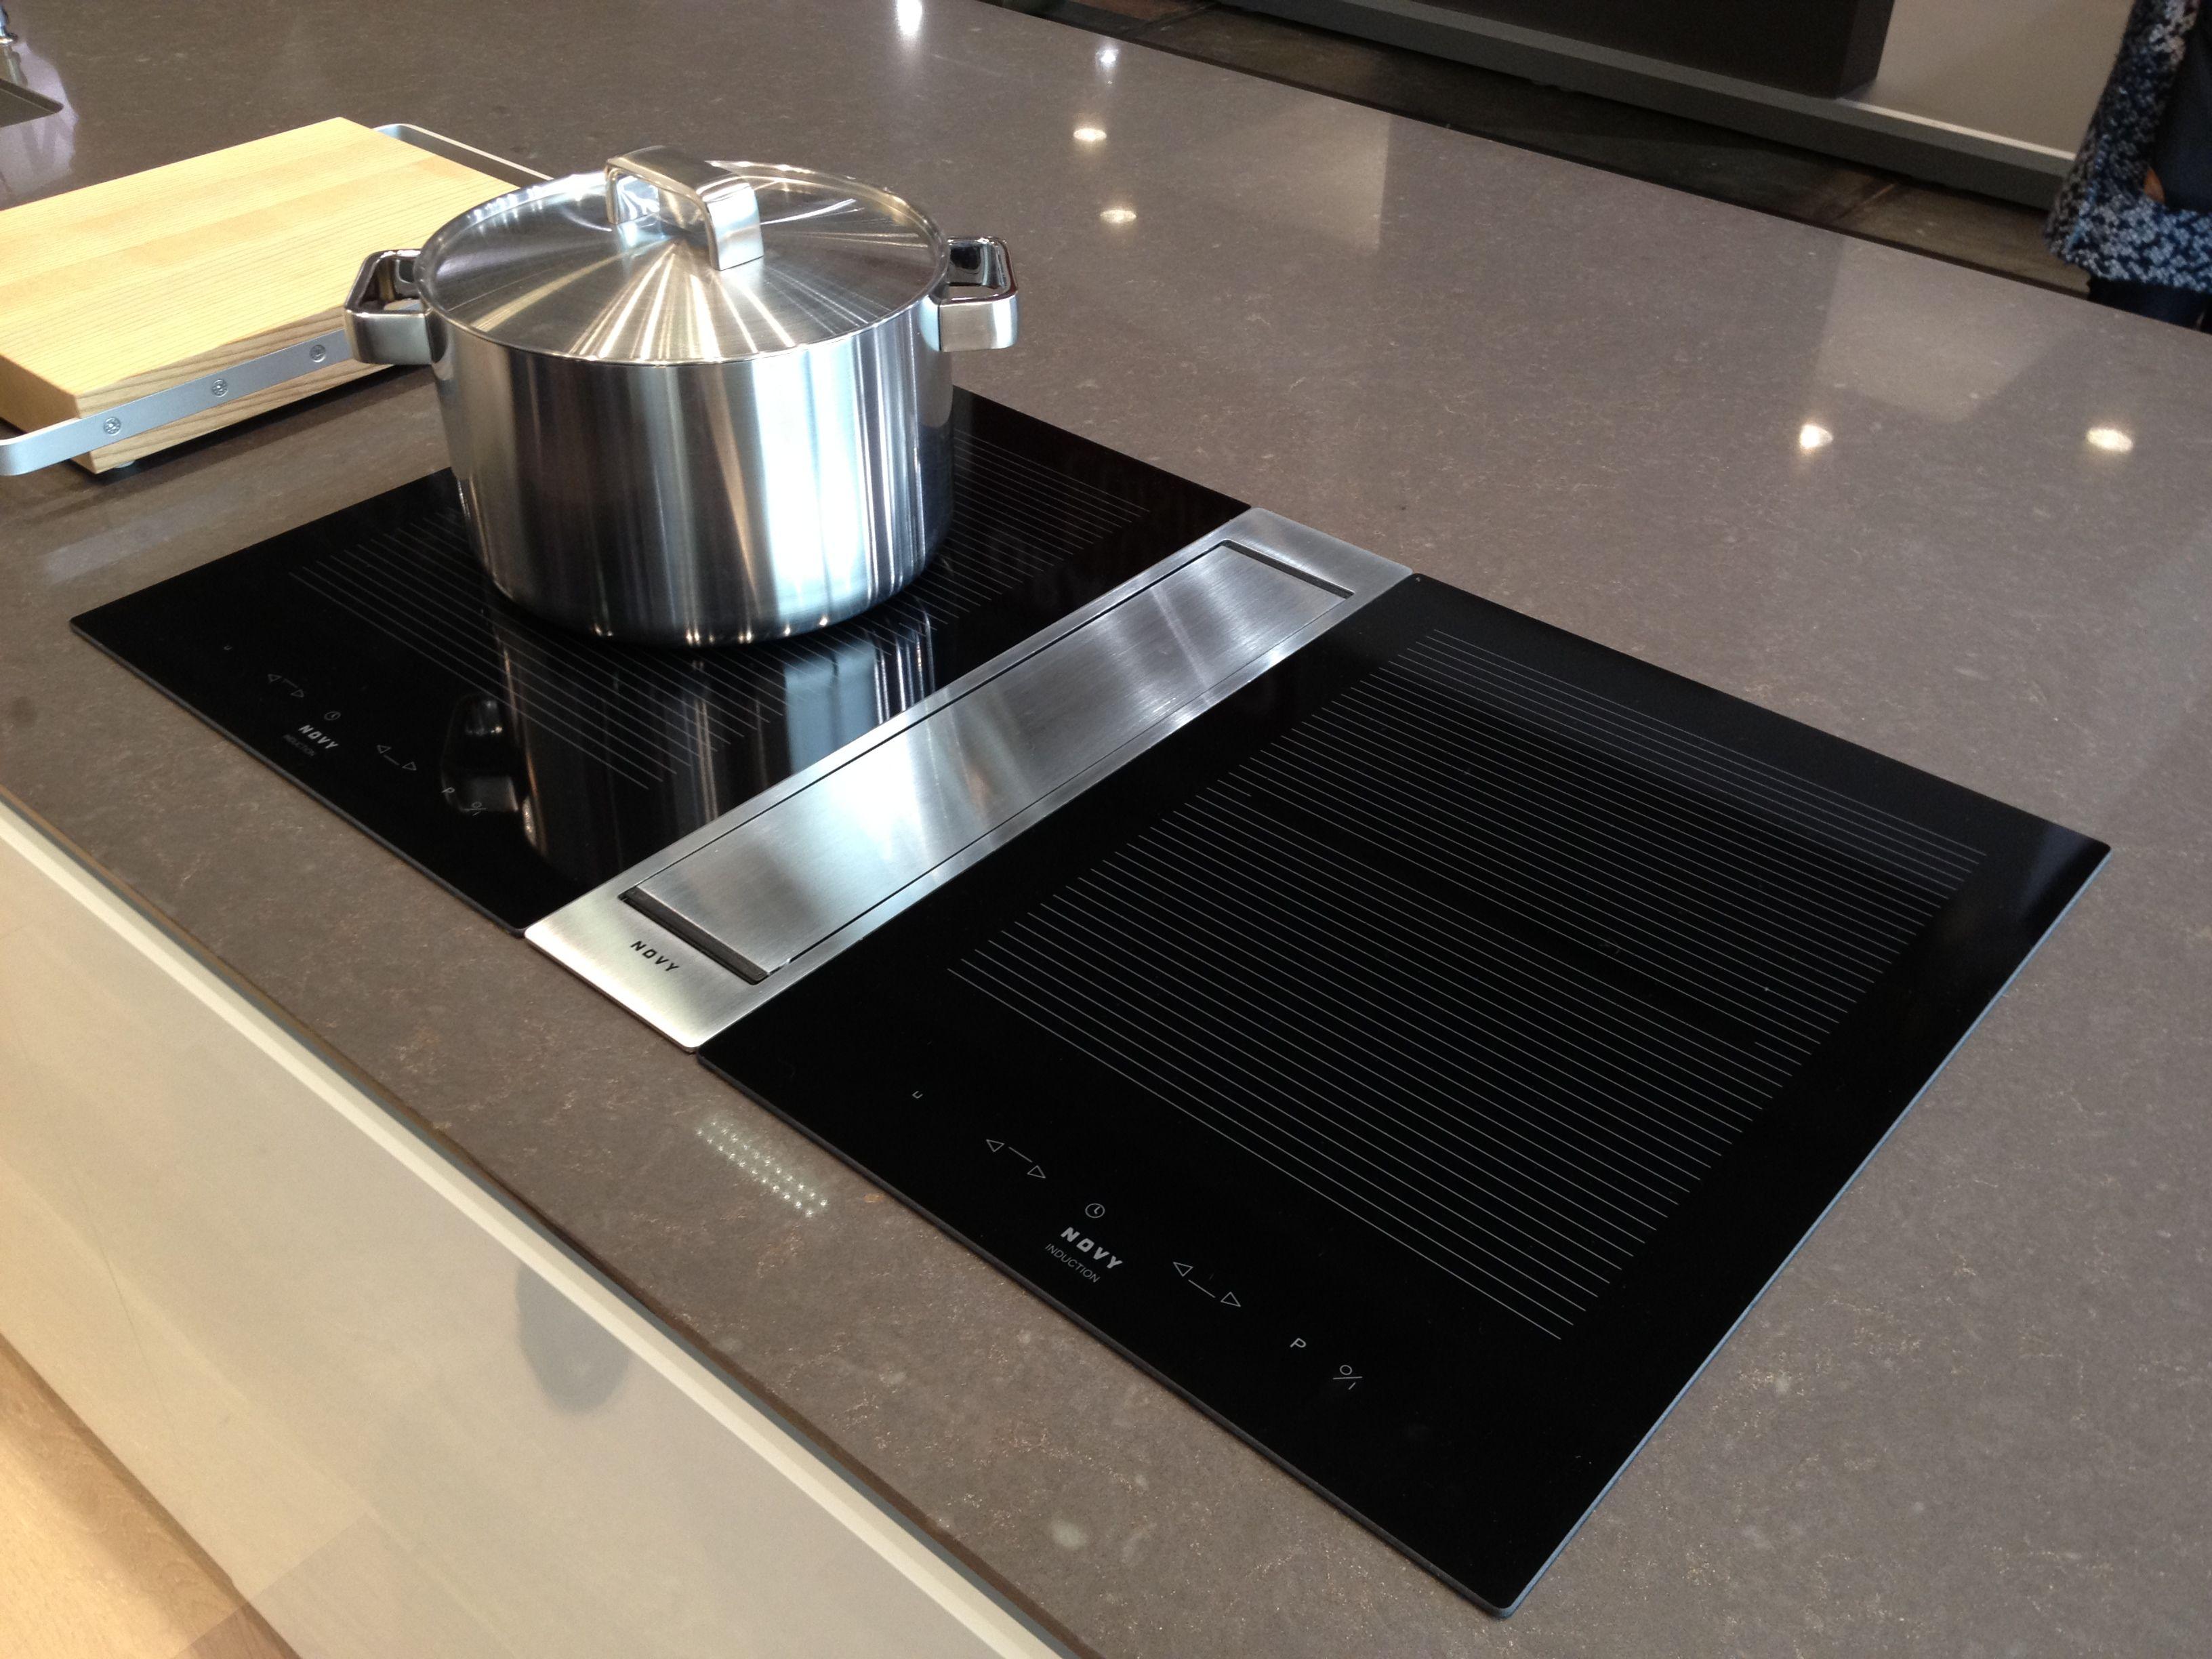 Campana extractora dunstabzugshaube cooker hood ciarra